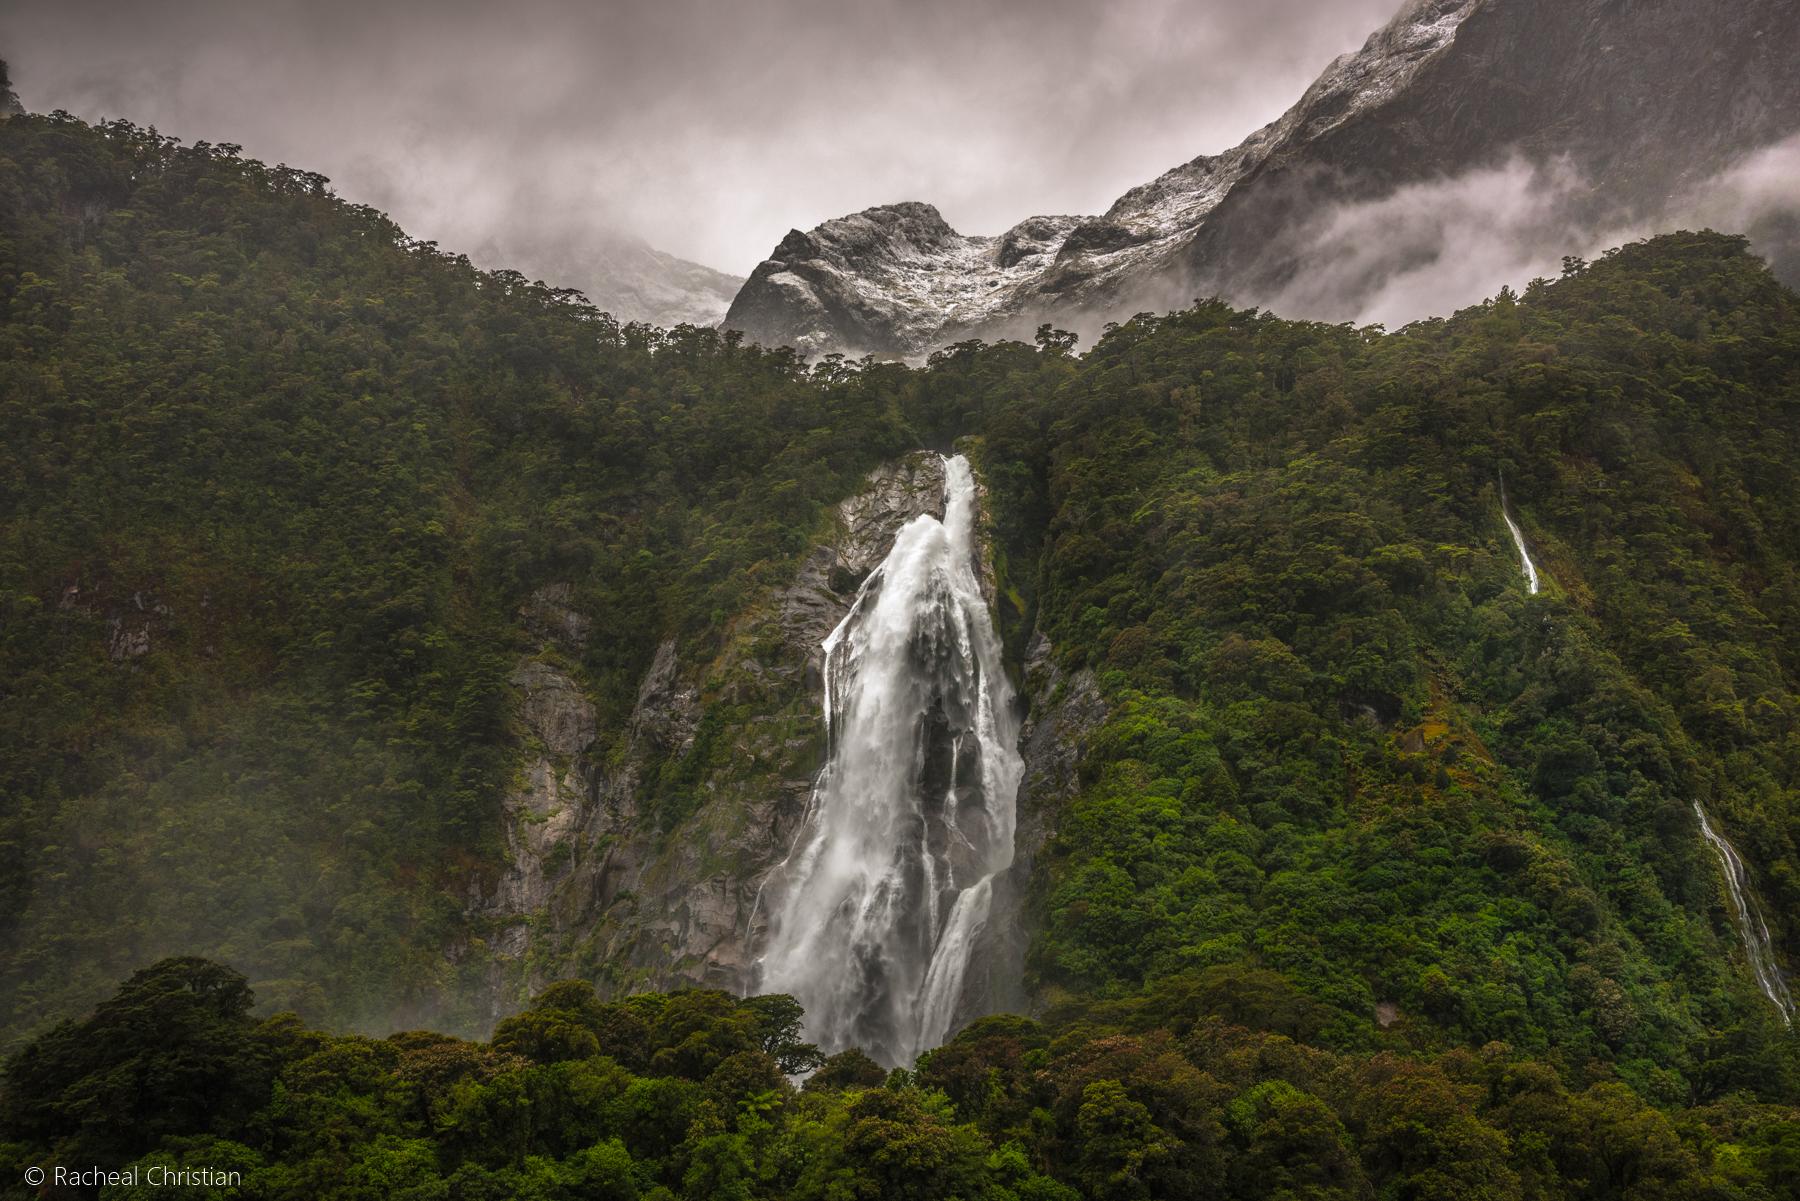 Lady Bowen Falls | Capturing Milford Sounds Tallest Waterfall by Racheal Christian - rachealchristianphotography.com